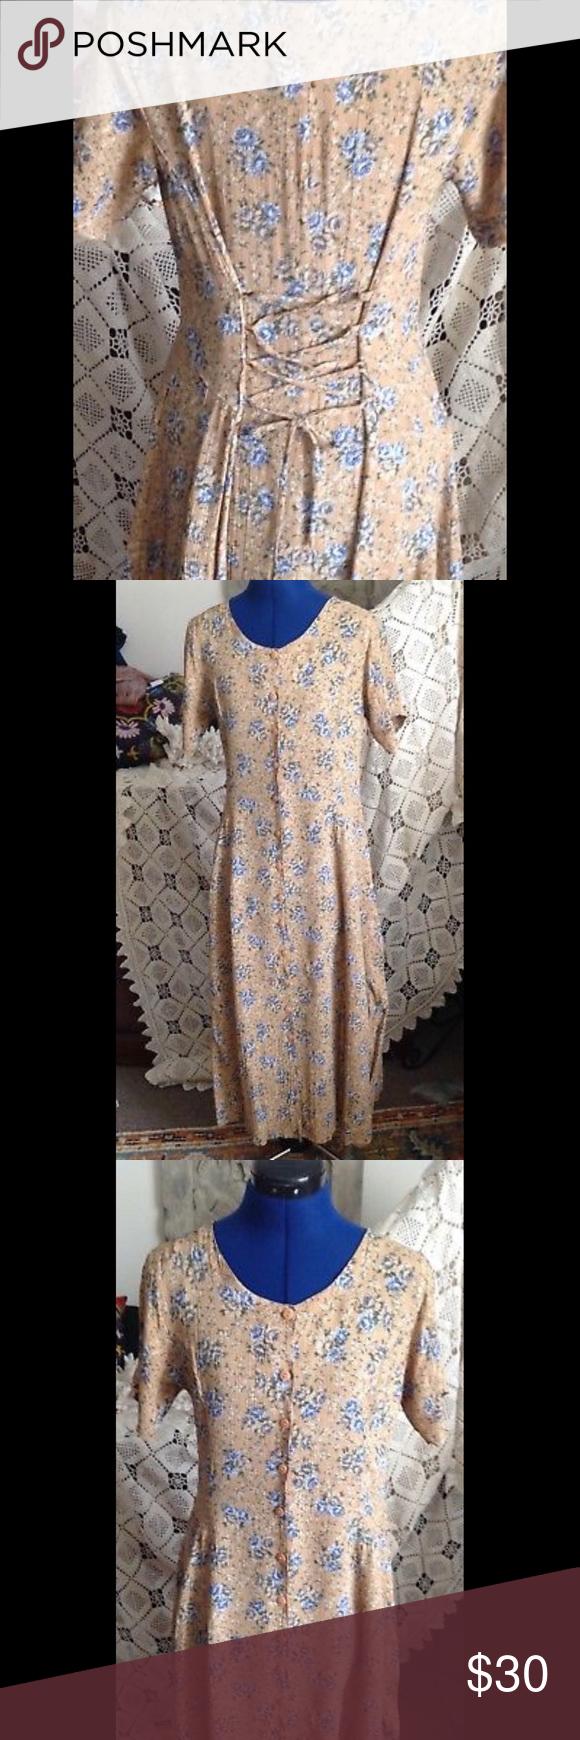 S corset back rayon dress floral gold blue my posh closet